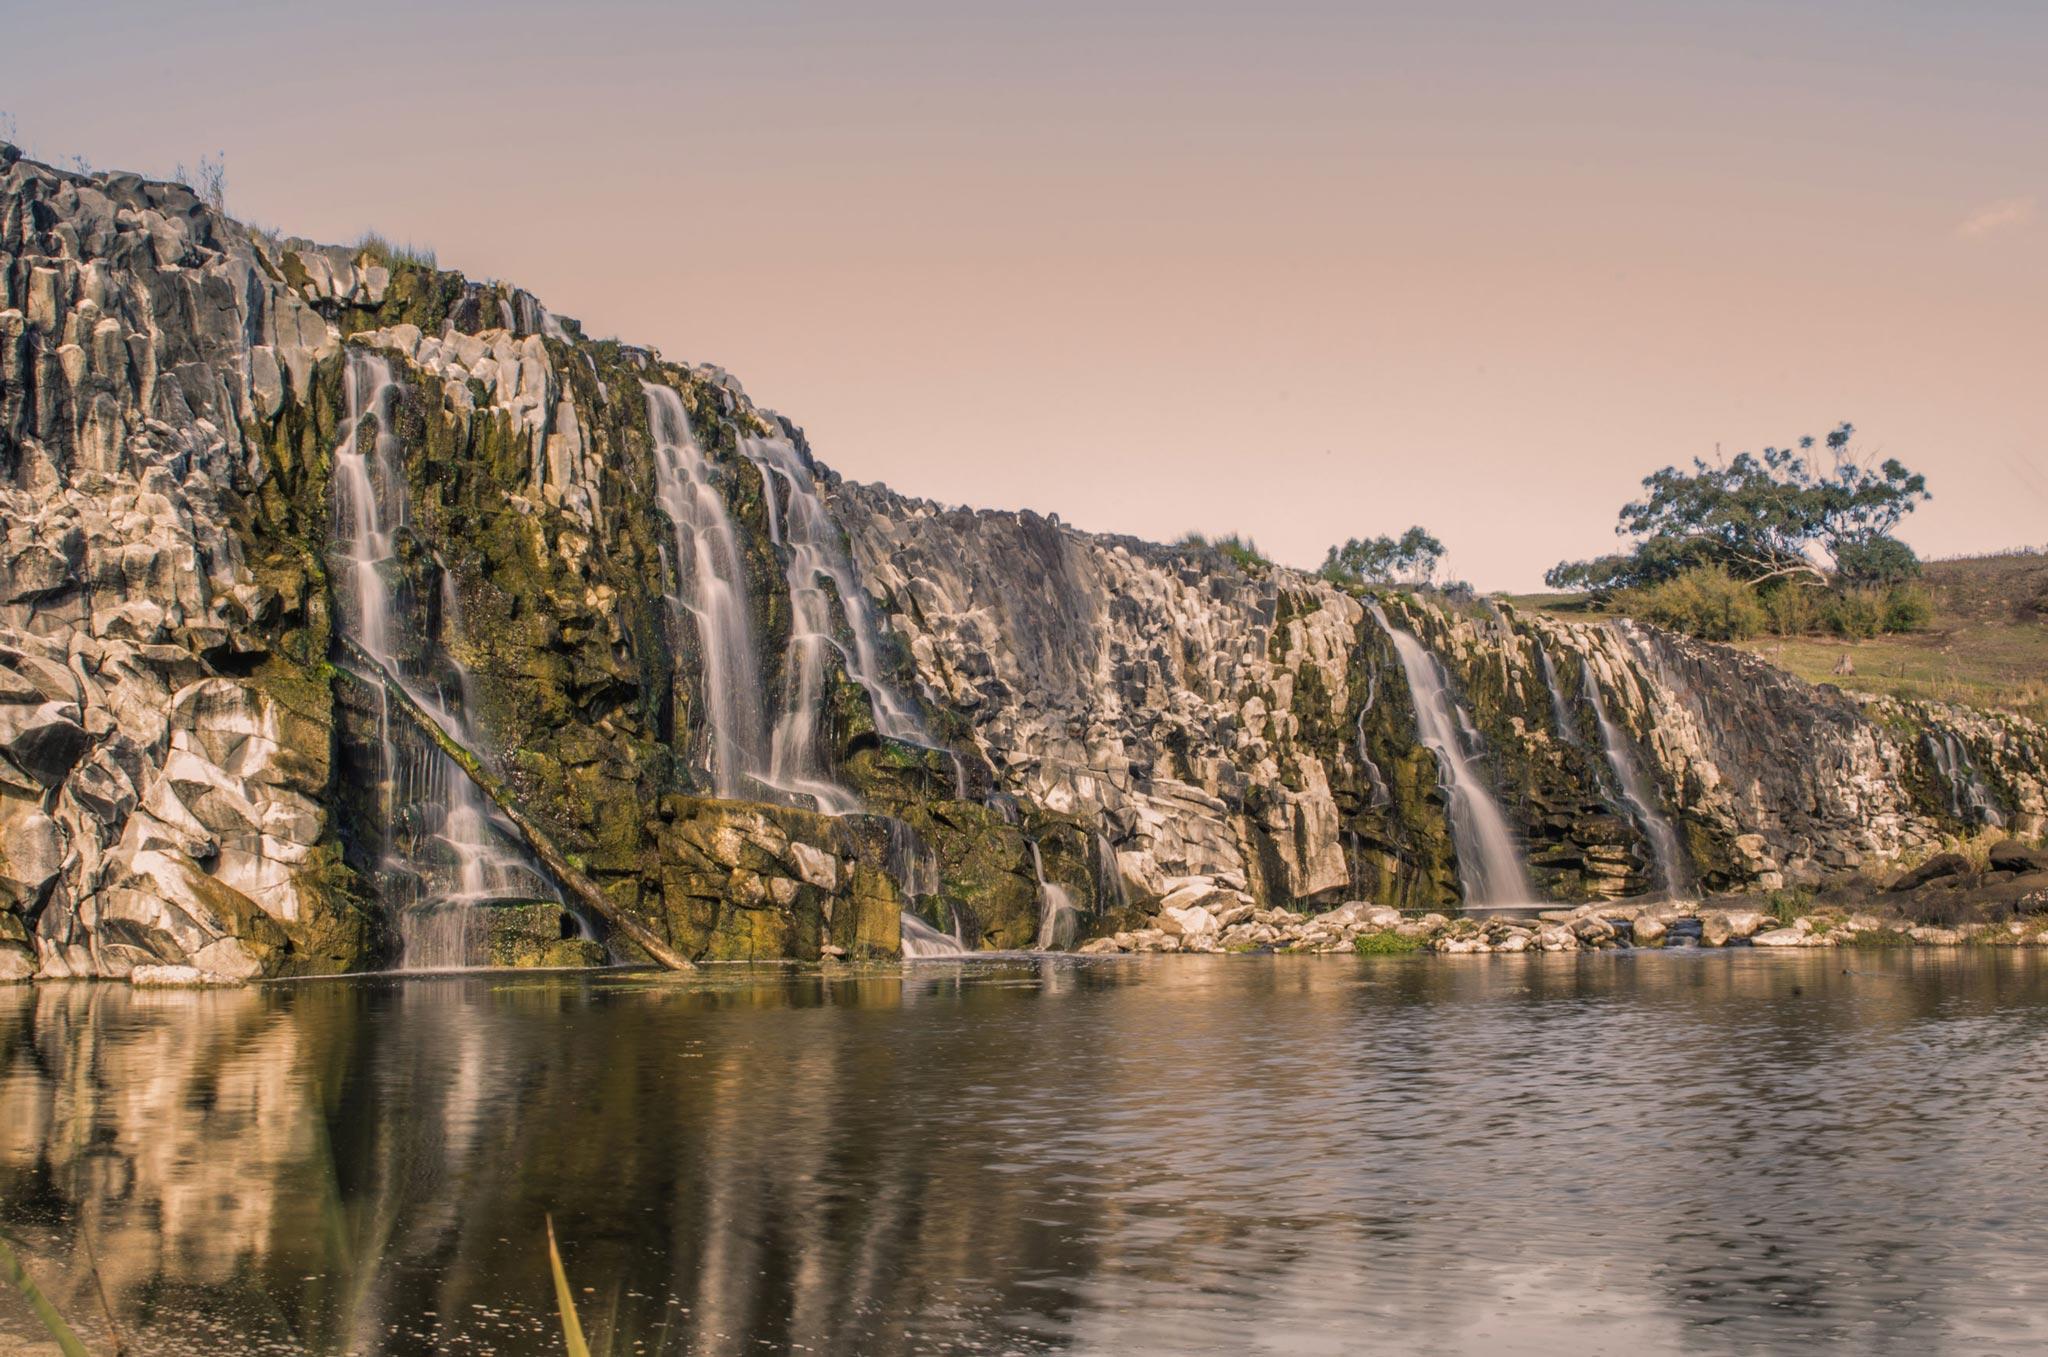 Paesaggi-Australia - DSC 5756 - Landscape photography Australia, Victoria -